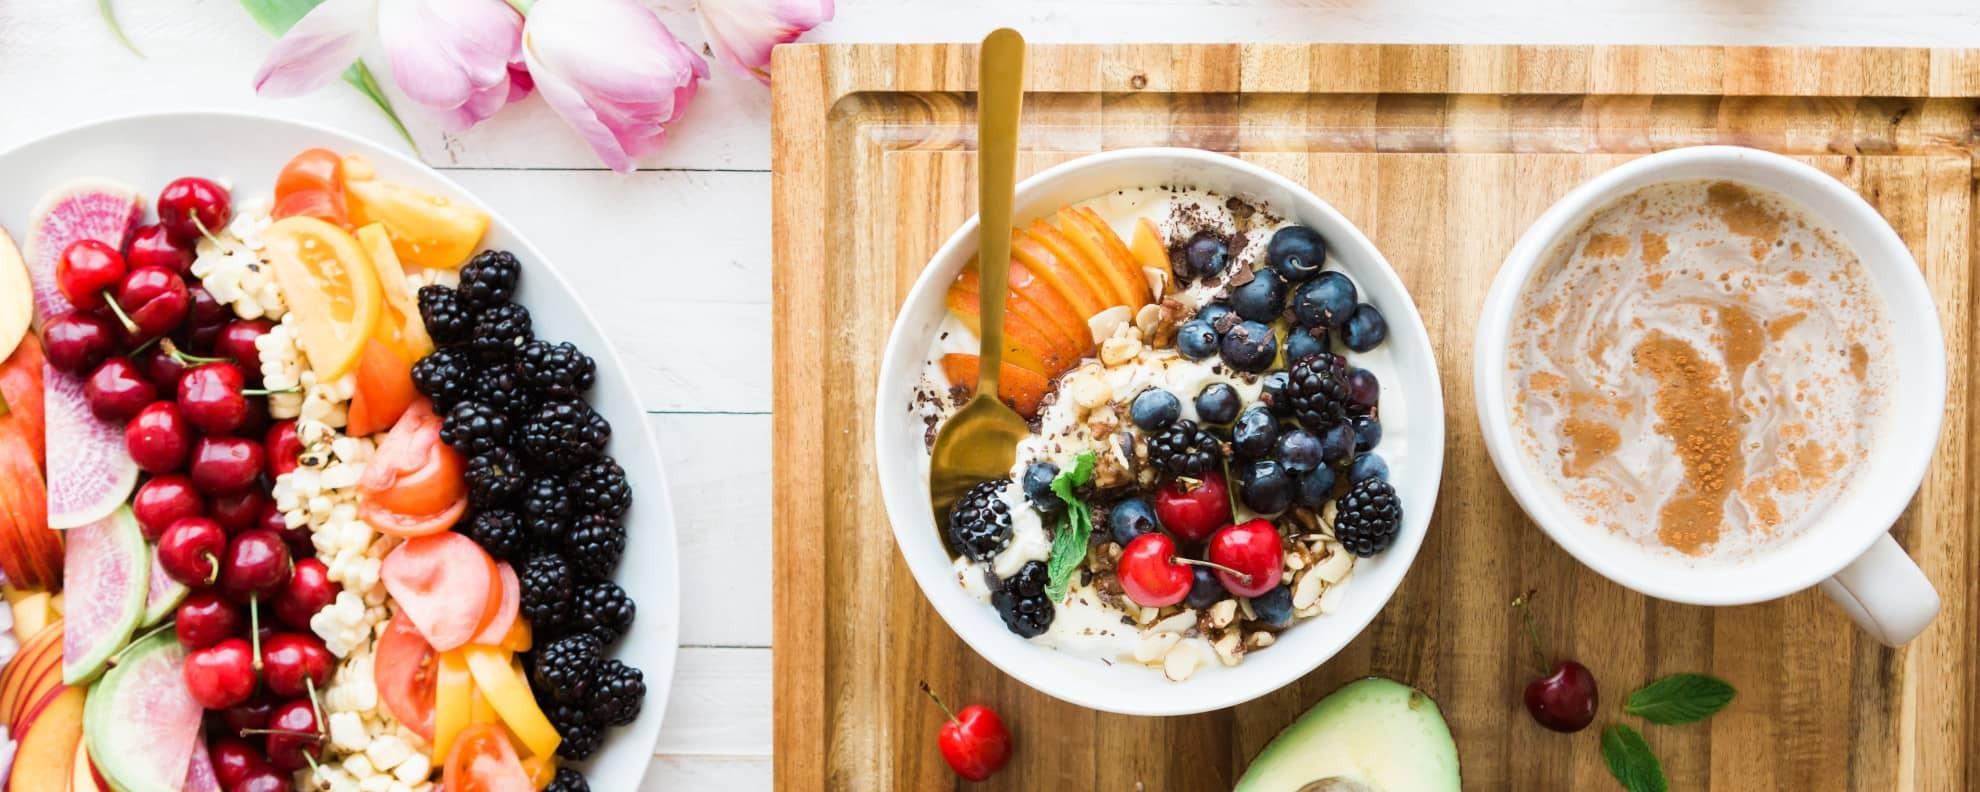 Welche Lebensmittel helfen gegen freie Radikale?